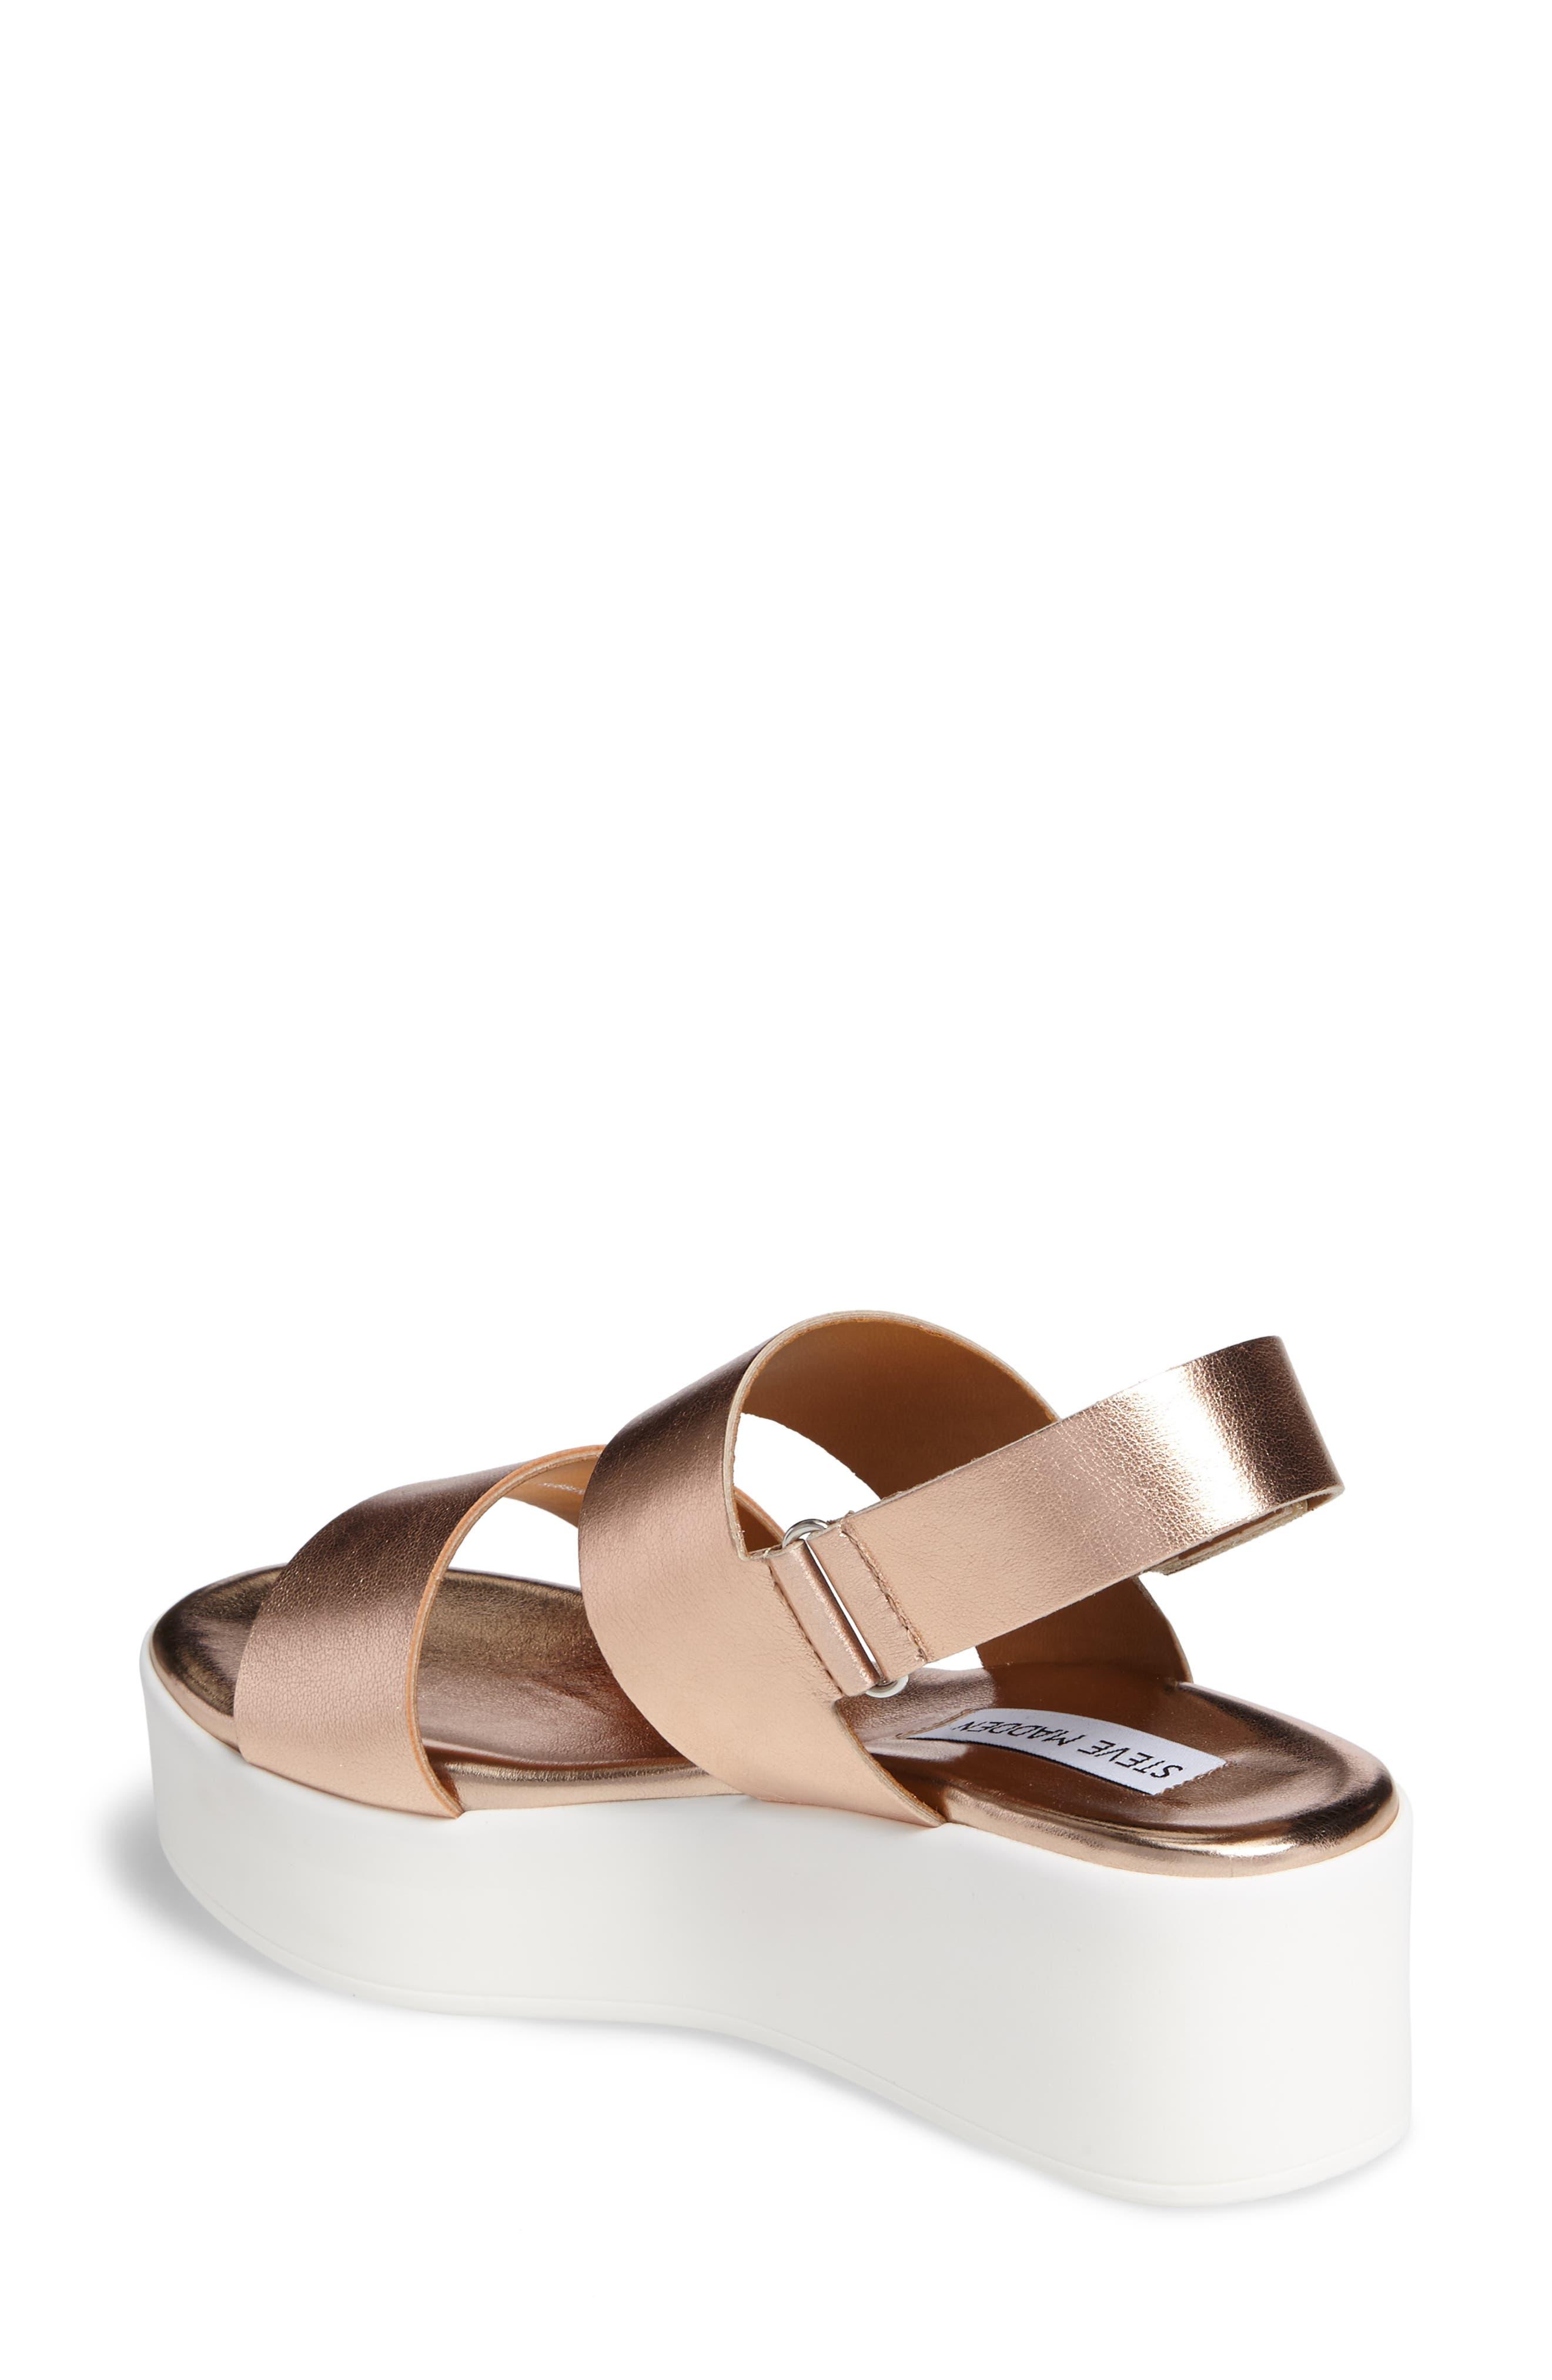 Rachel Platform Wedge Sandal,                             Alternate thumbnail 10, color,